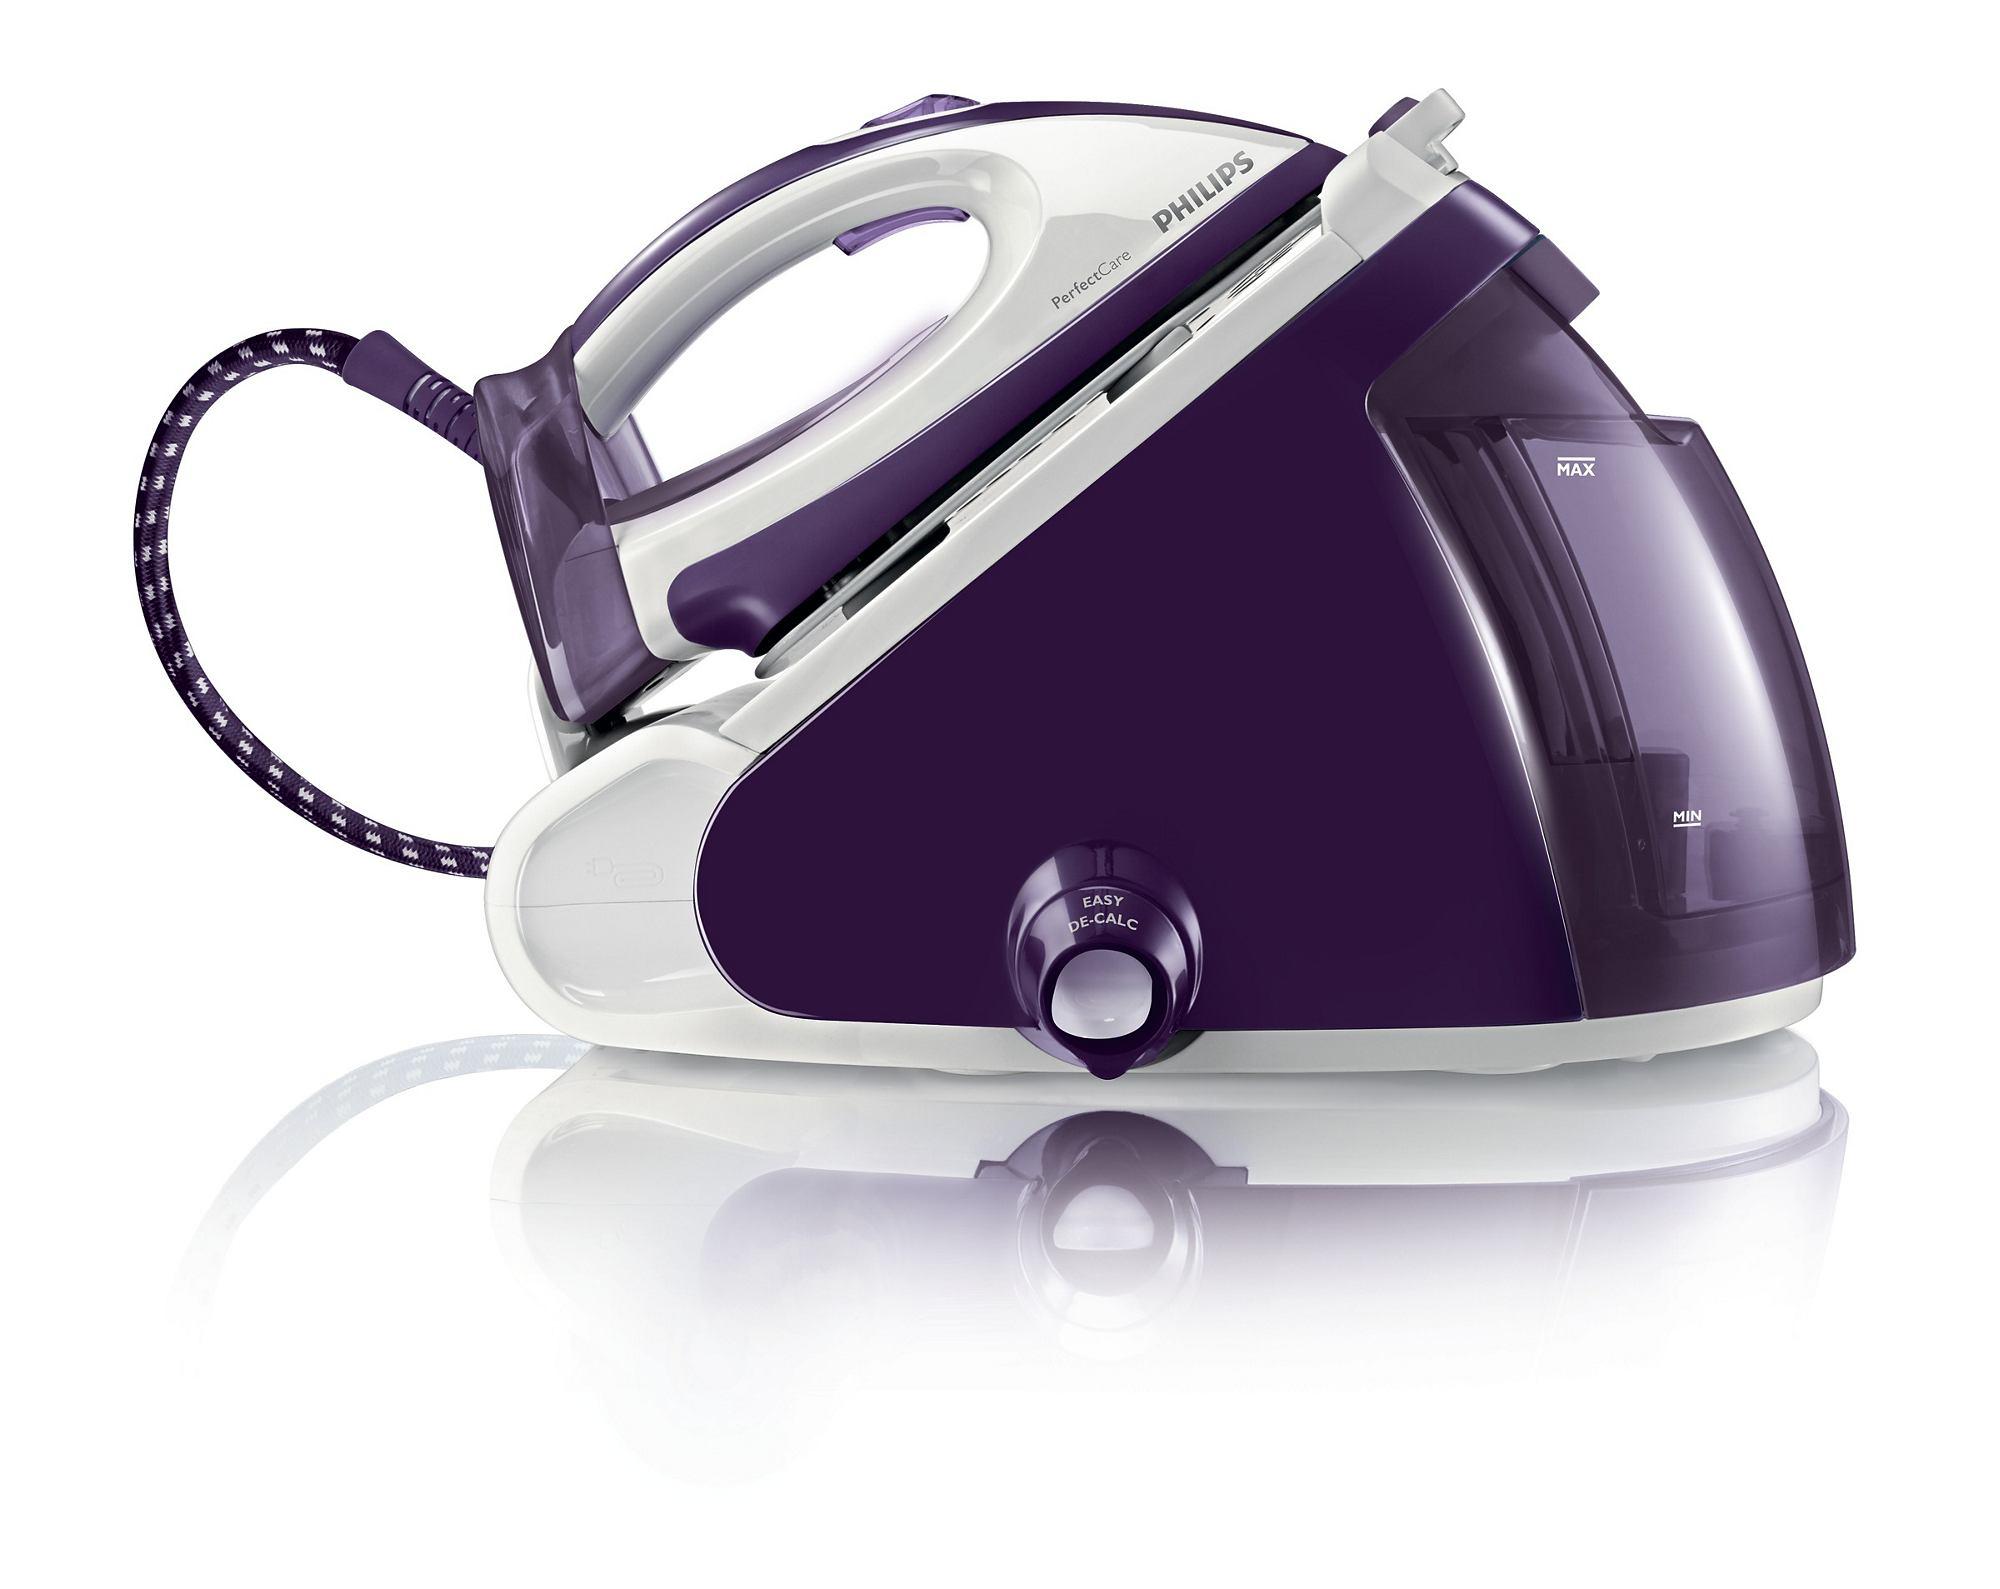 philips gc9240 02 perfect care steam generator iron ebay. Black Bedroom Furniture Sets. Home Design Ideas